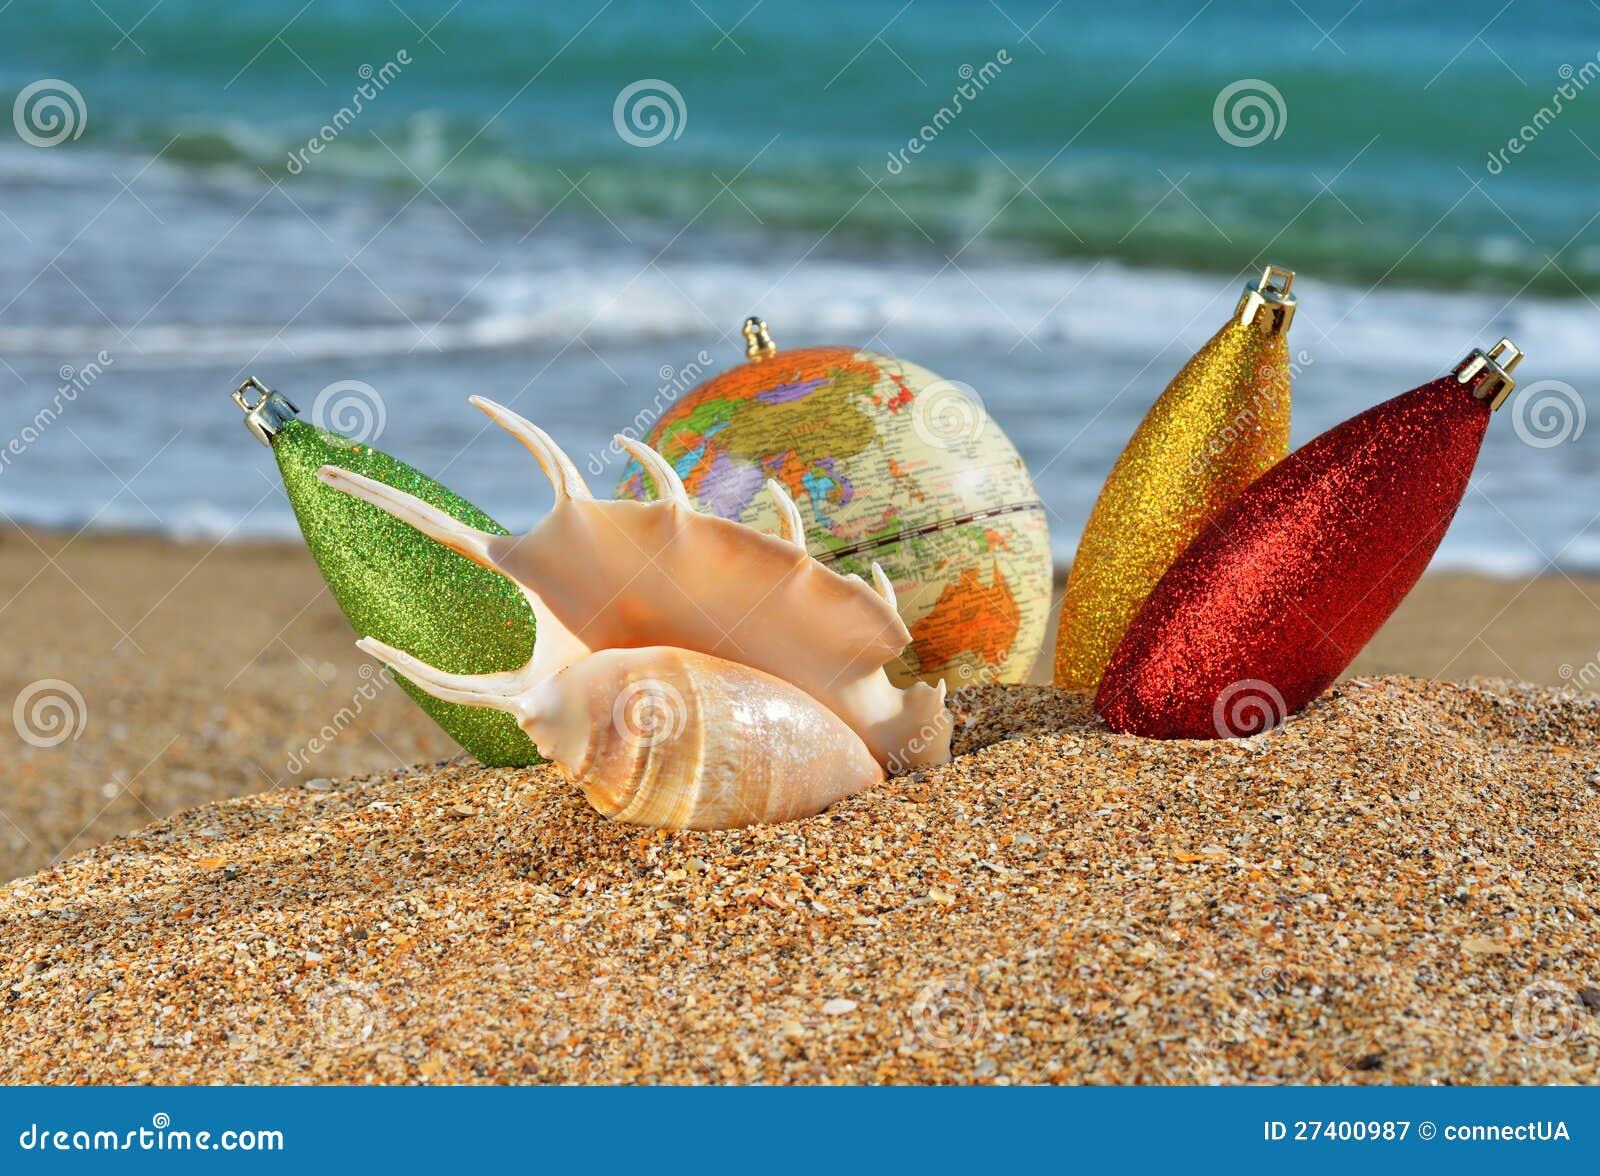 Seashell christmas ornaments - Christmas Decorations And Seashell On The Beach